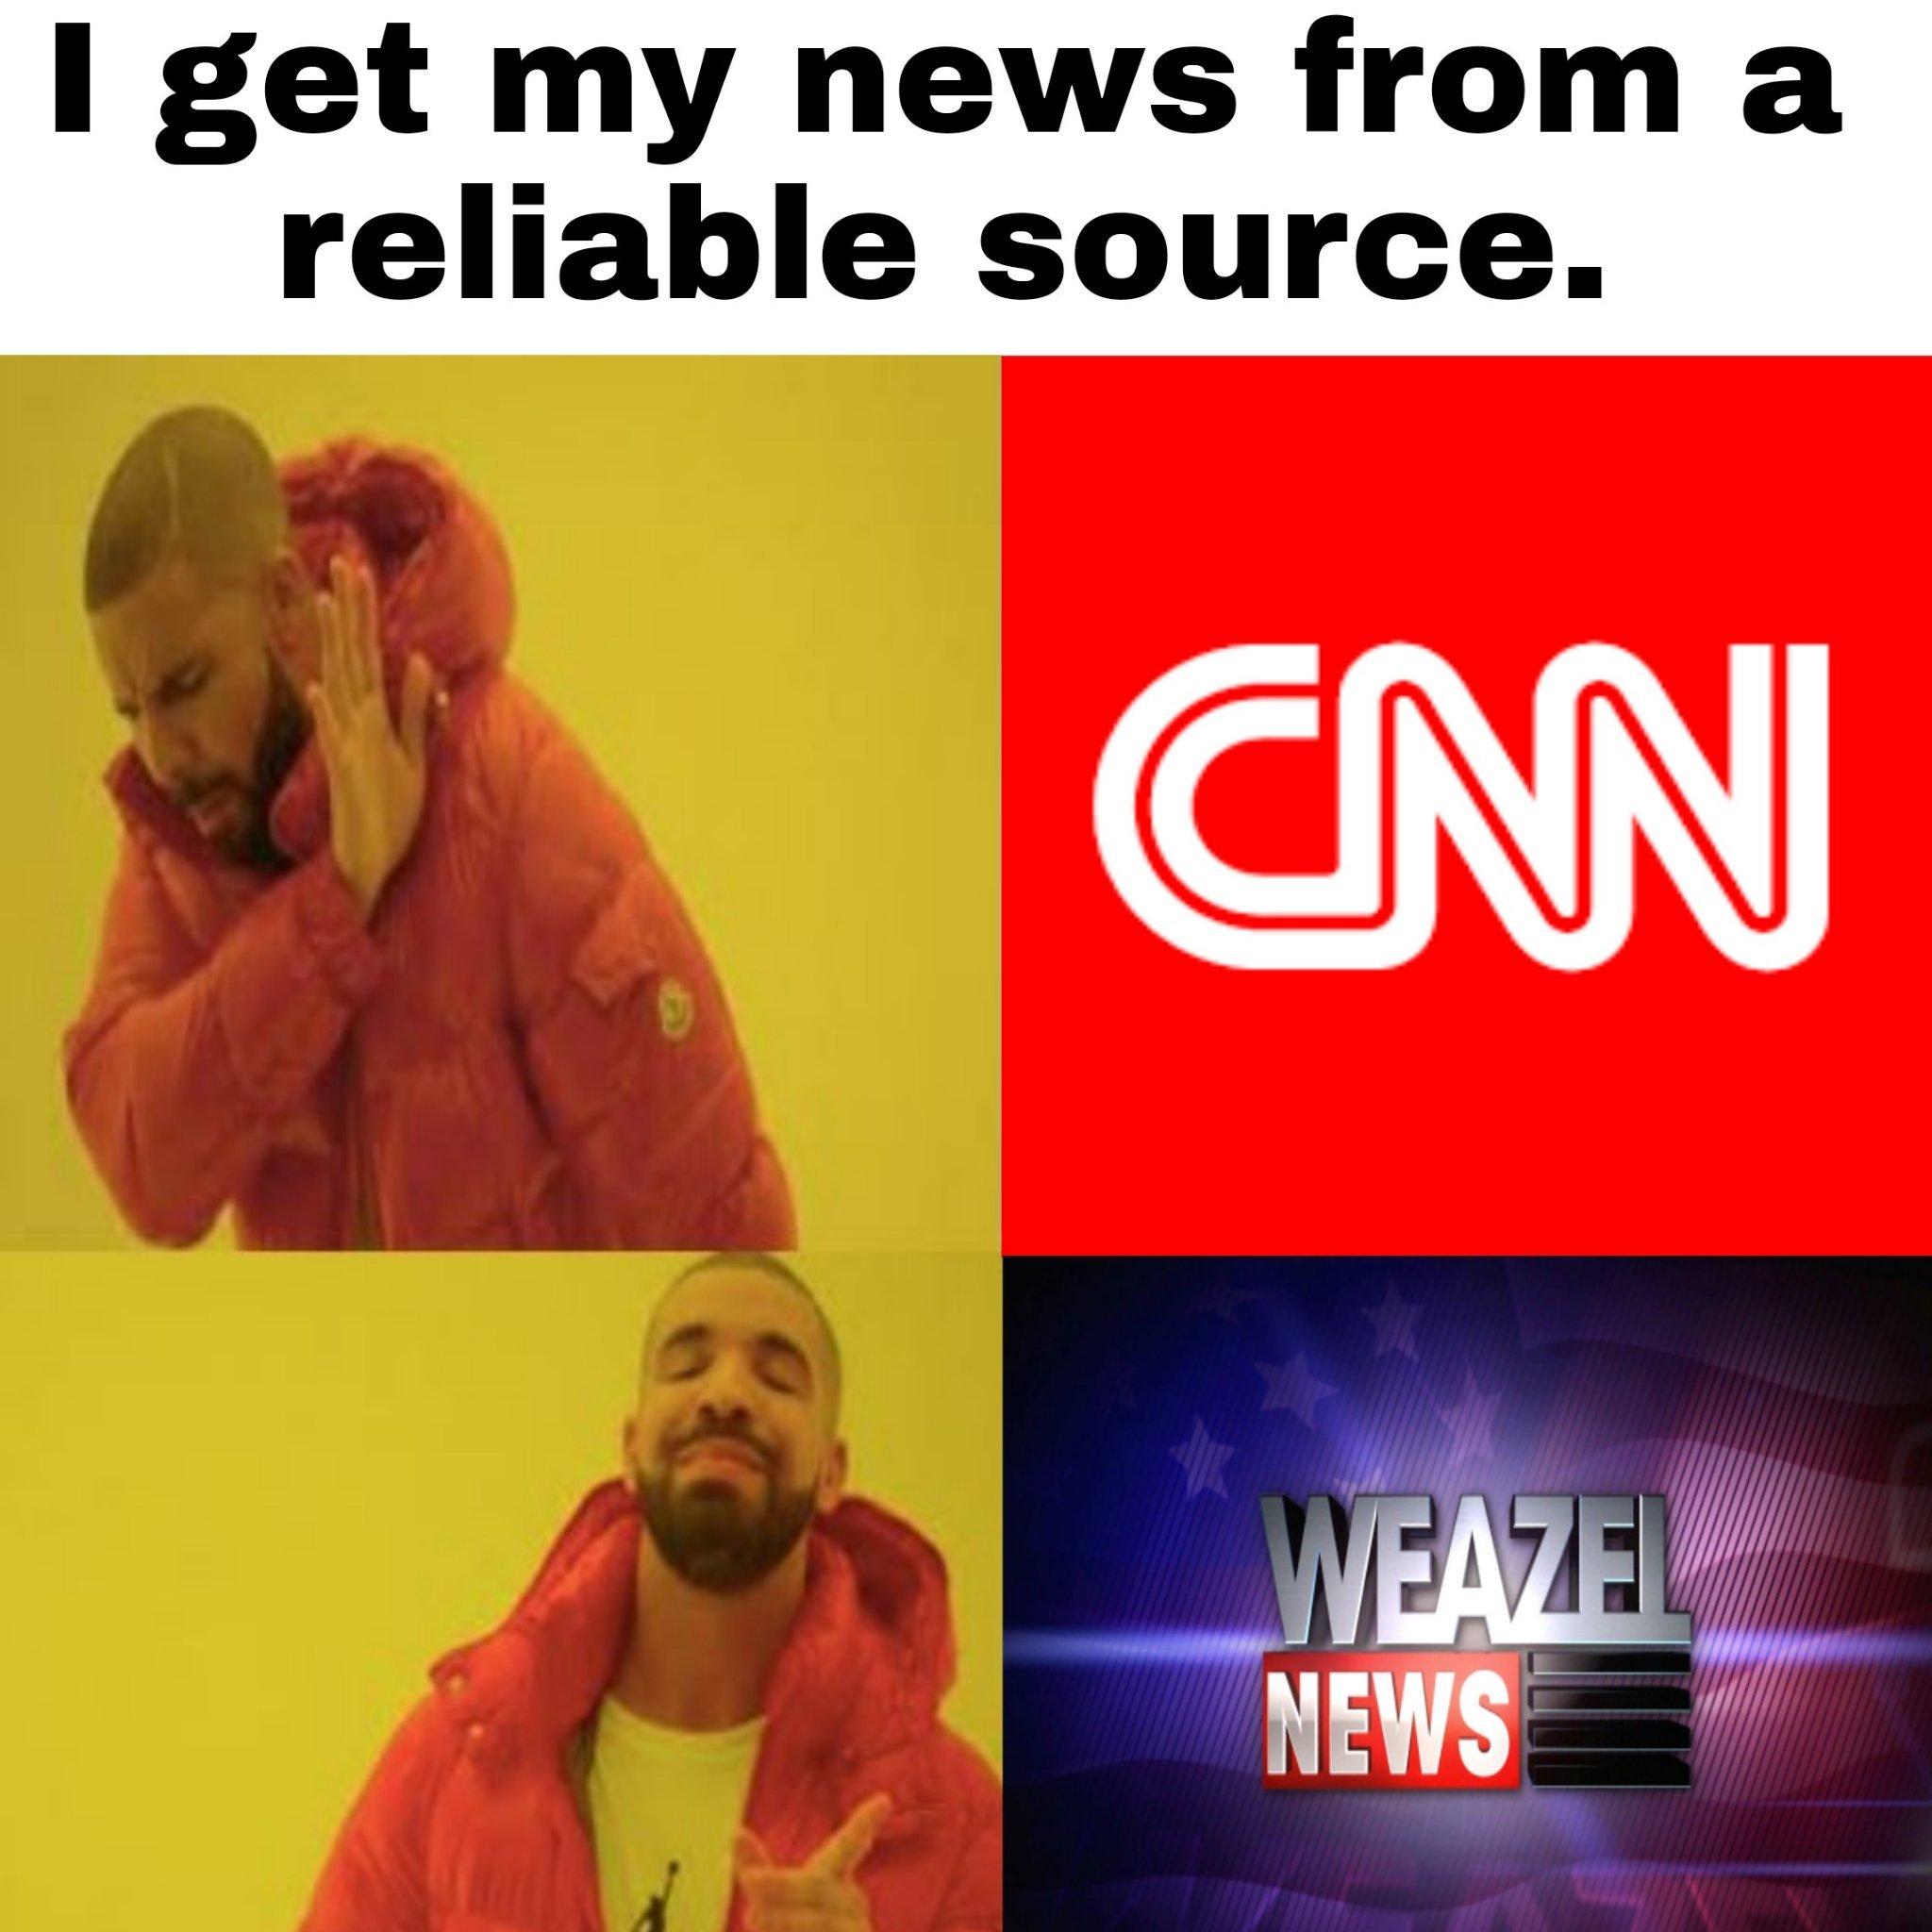 Reliable News - meme